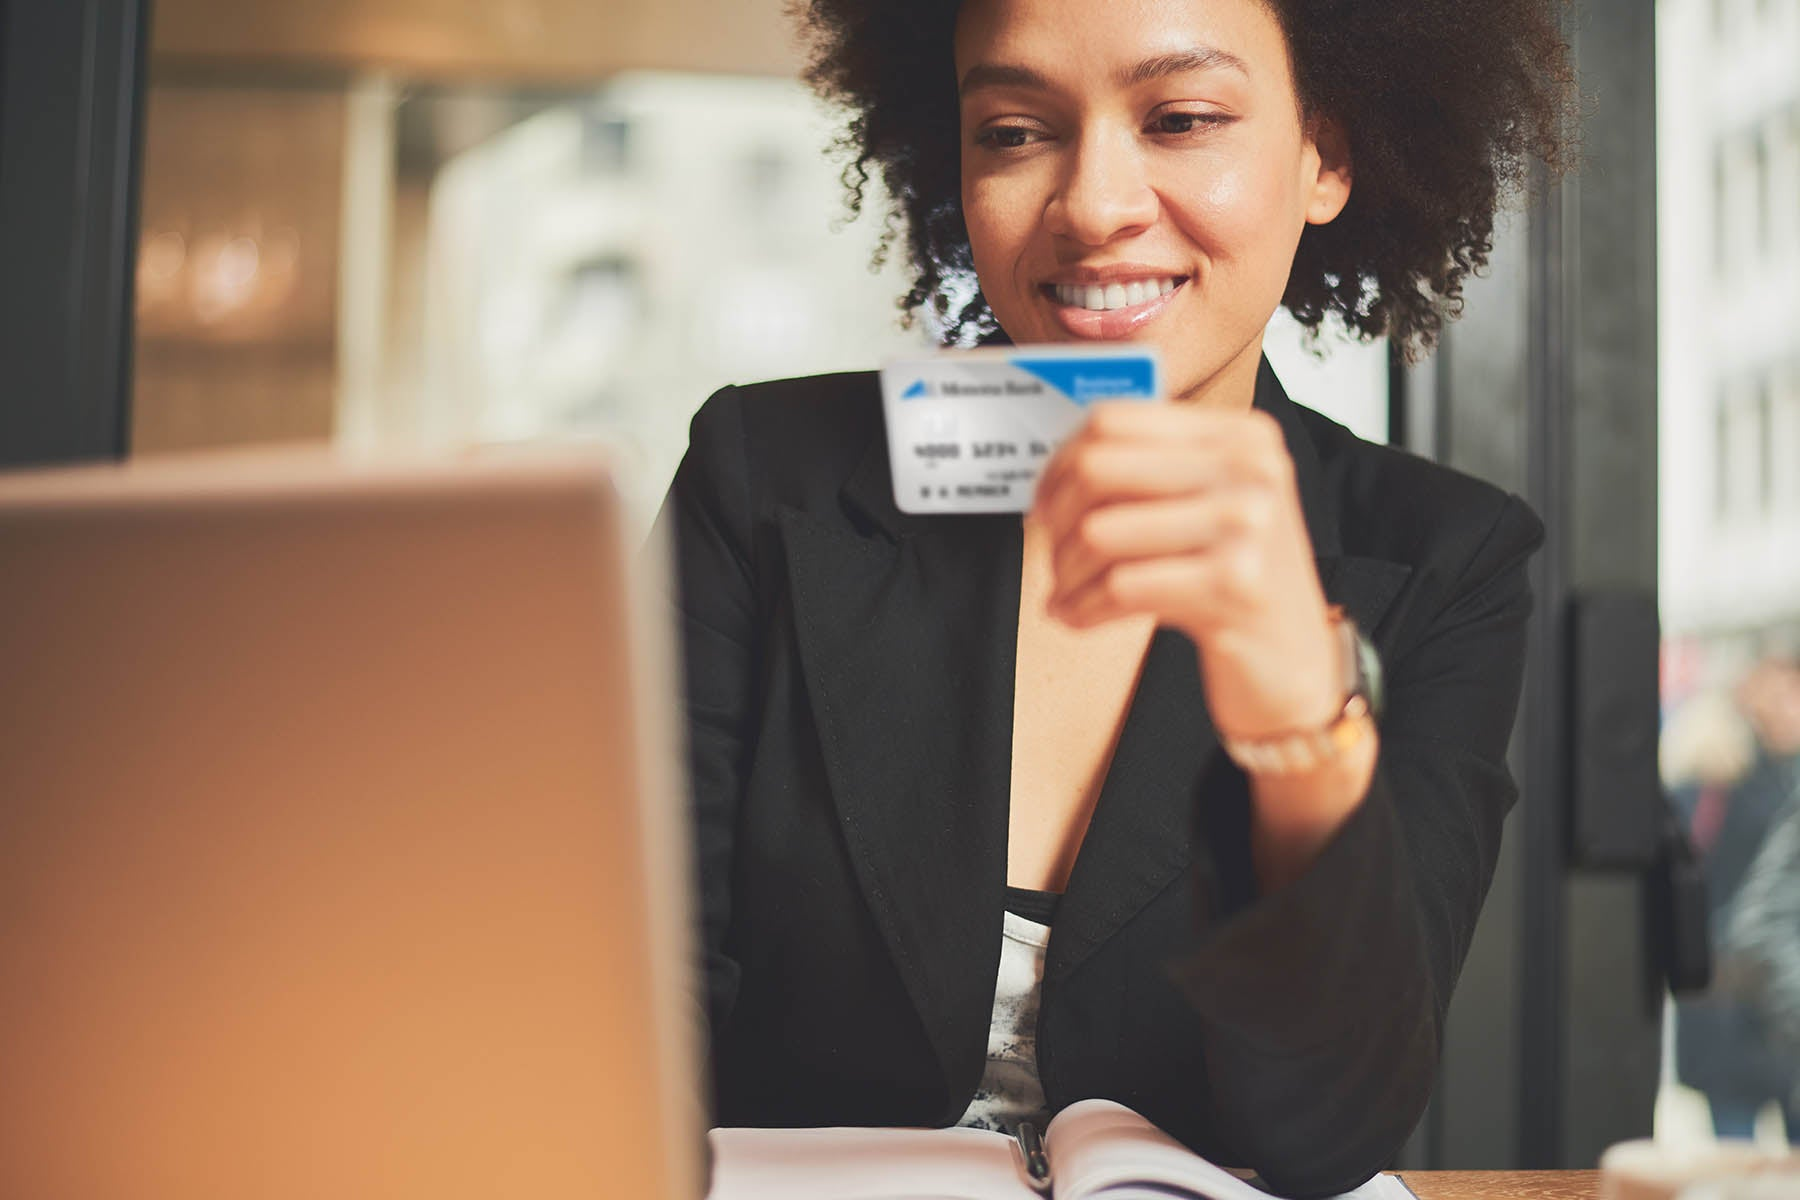 Woman using Business Debit Card